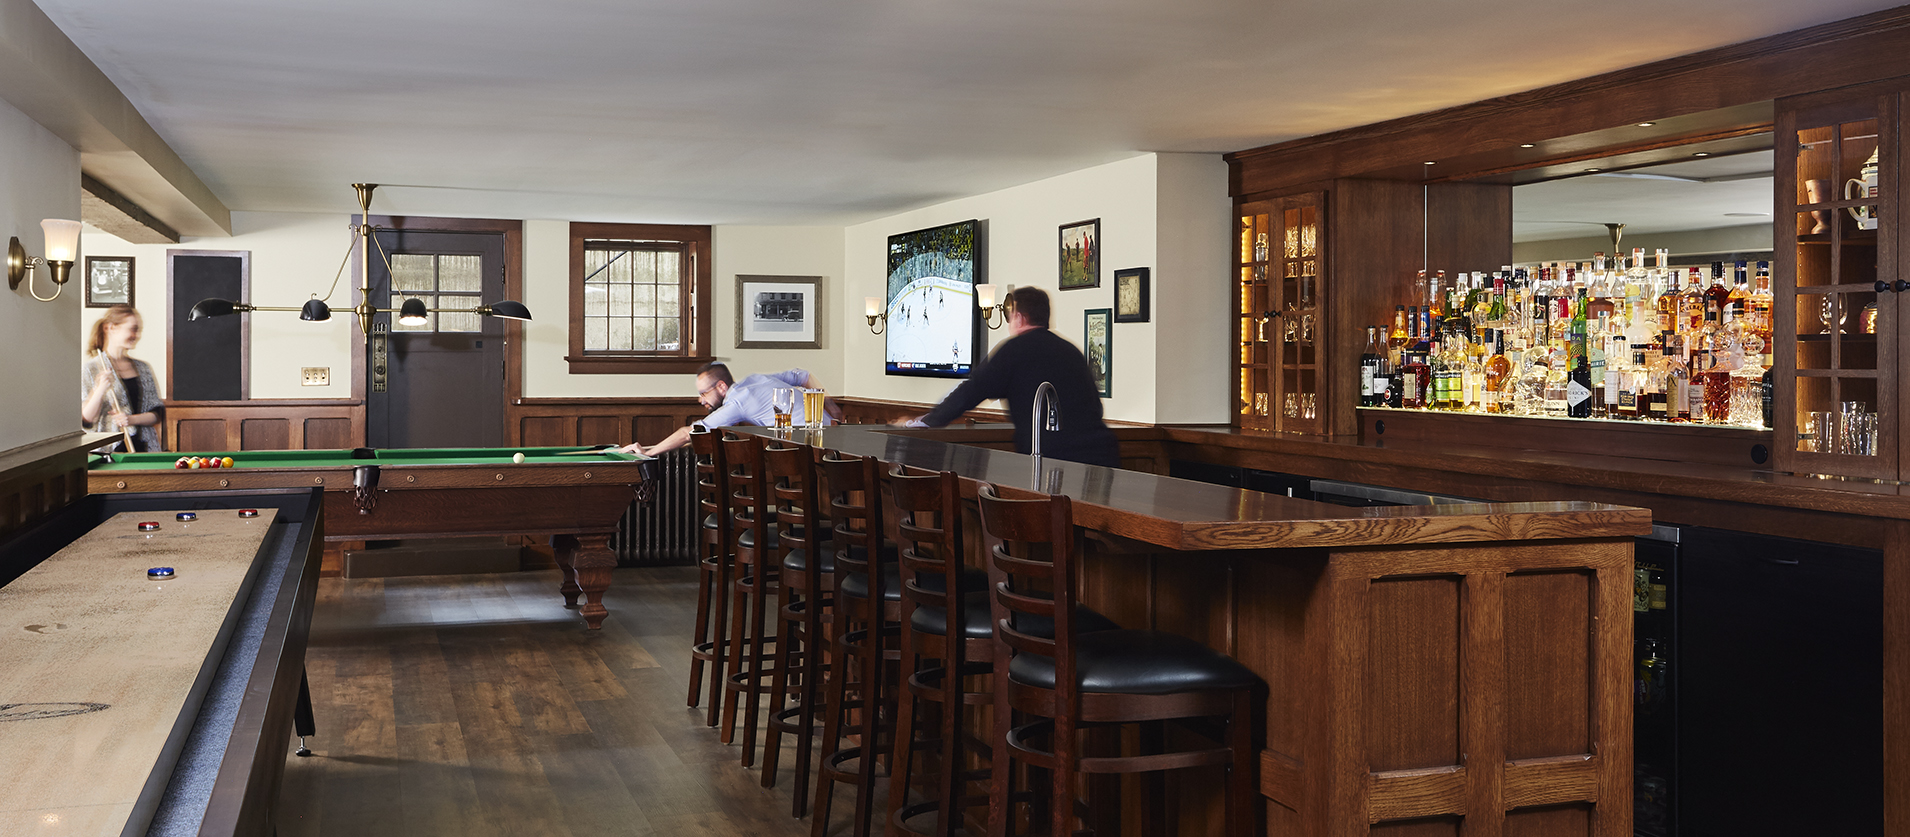 lower level pub